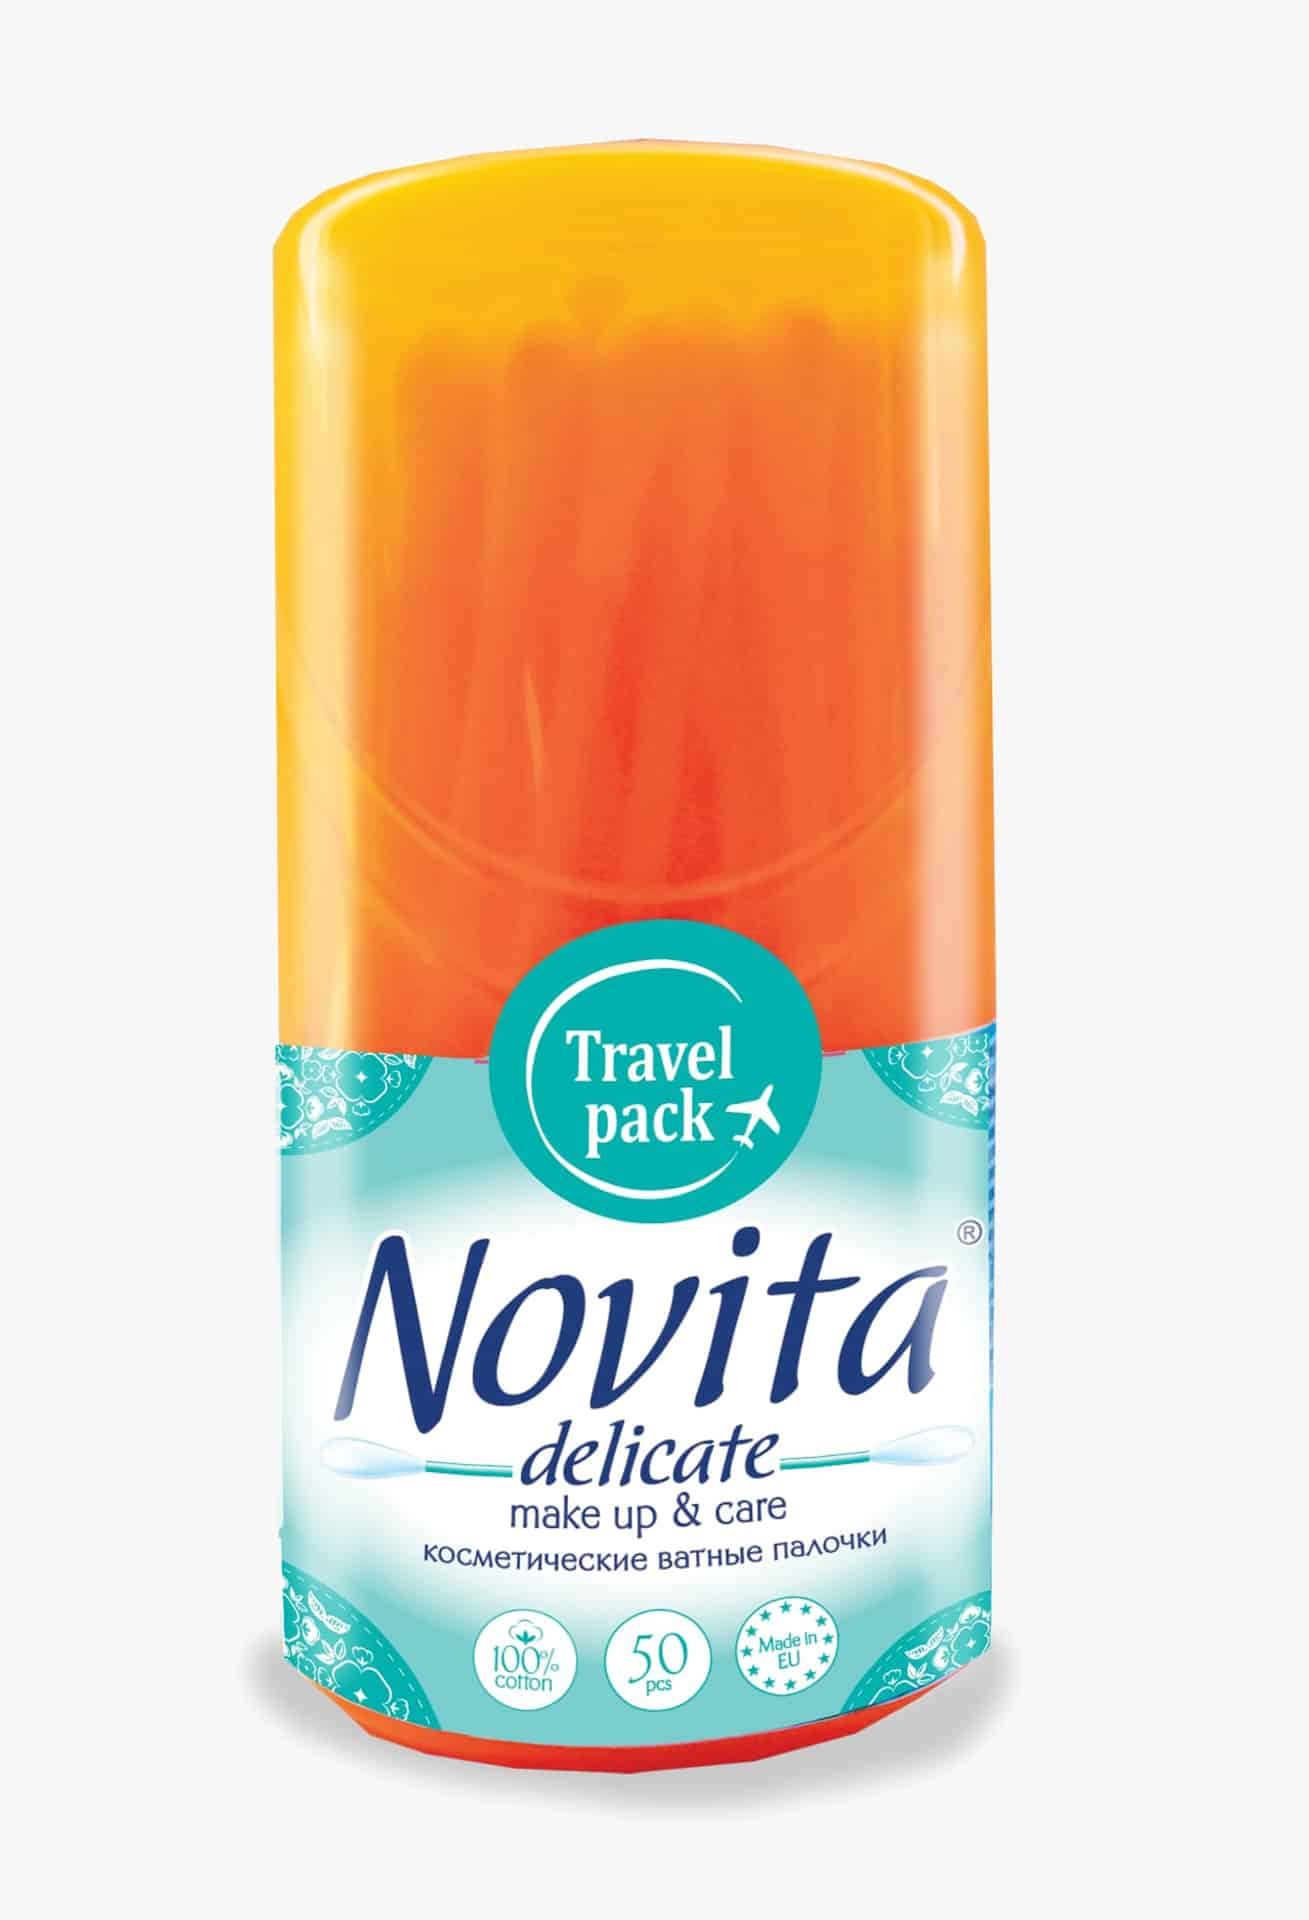 NOVITA Delicate Палички ватні в круглiй банці, моноблок, 50шт.